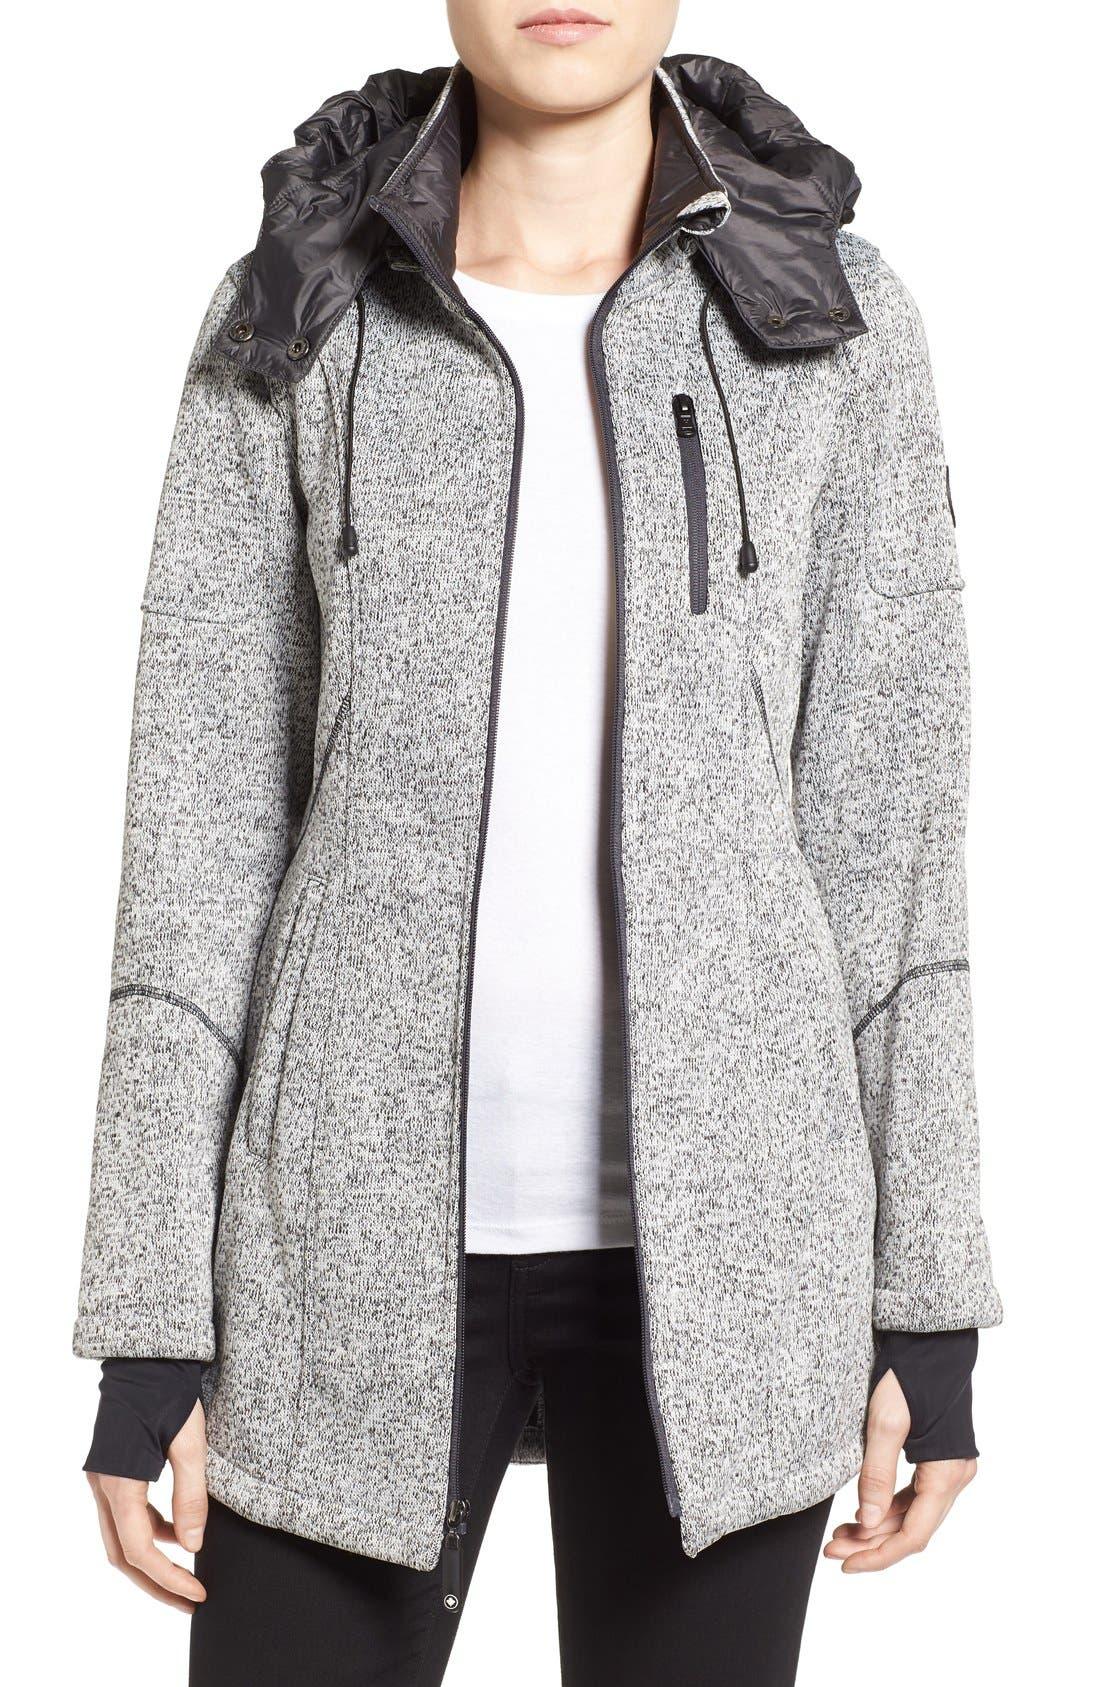 Bonded Knit Zip Front Jacket,                         Main,                         color, 070